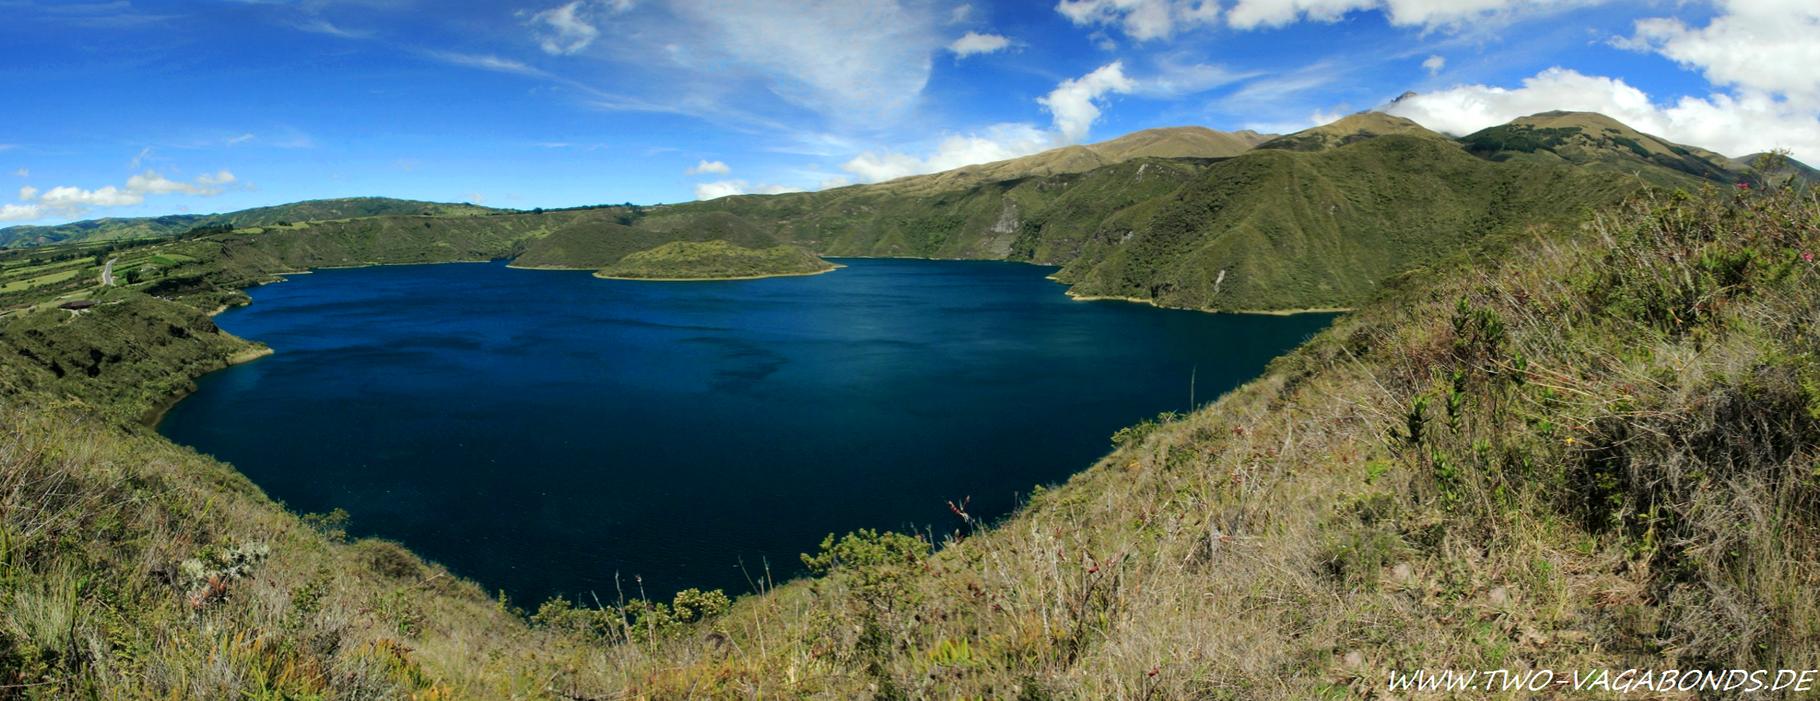 ECUADOR 2014 - LAGUNA MOJANDA